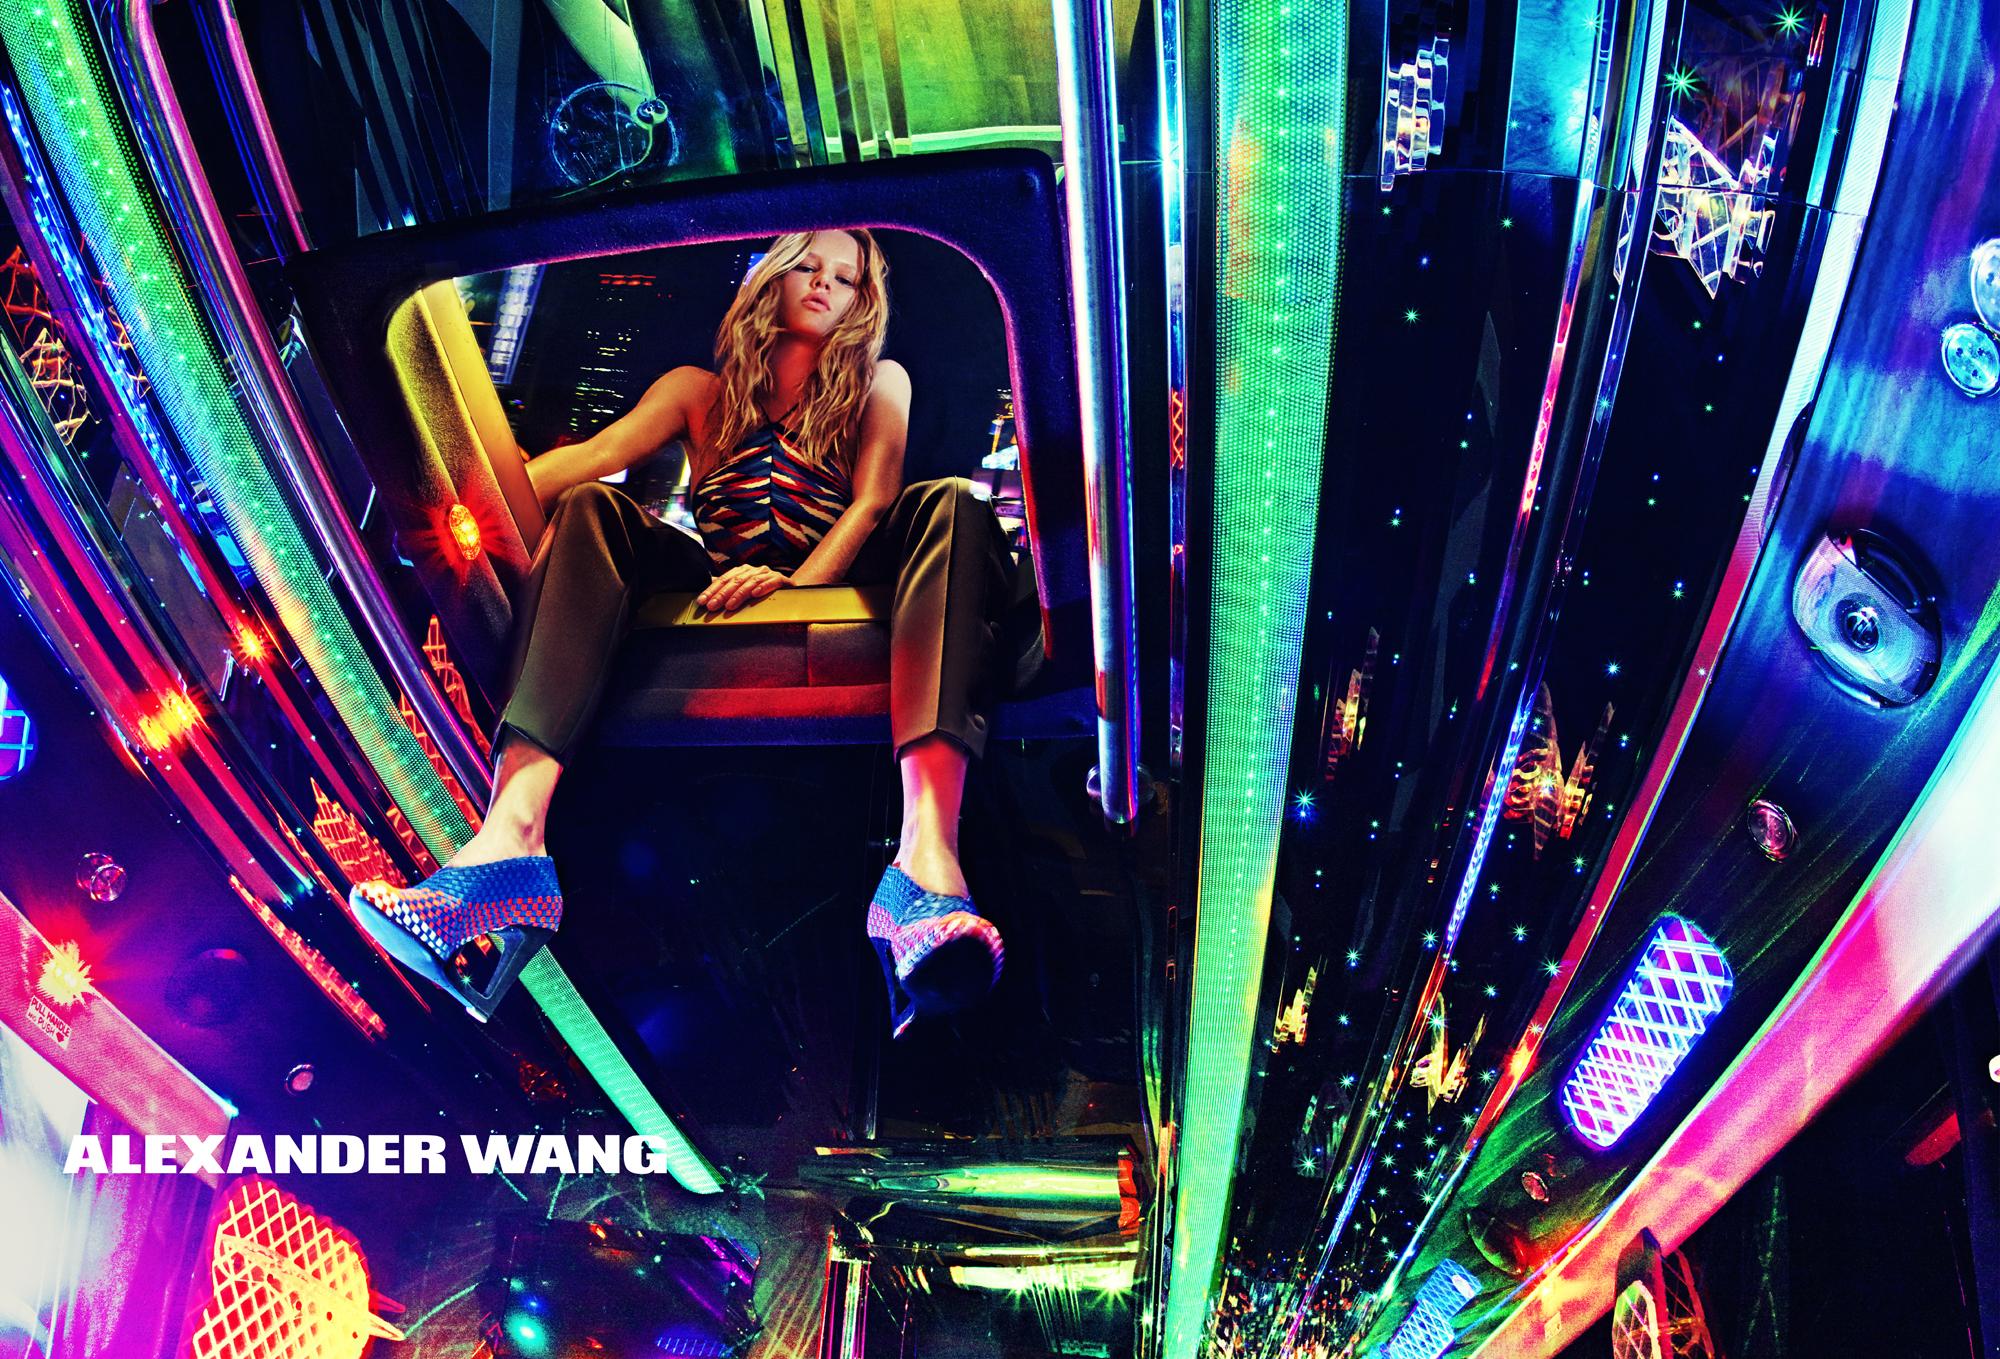 alexander-wang-spring-2015-ad-campaign-05